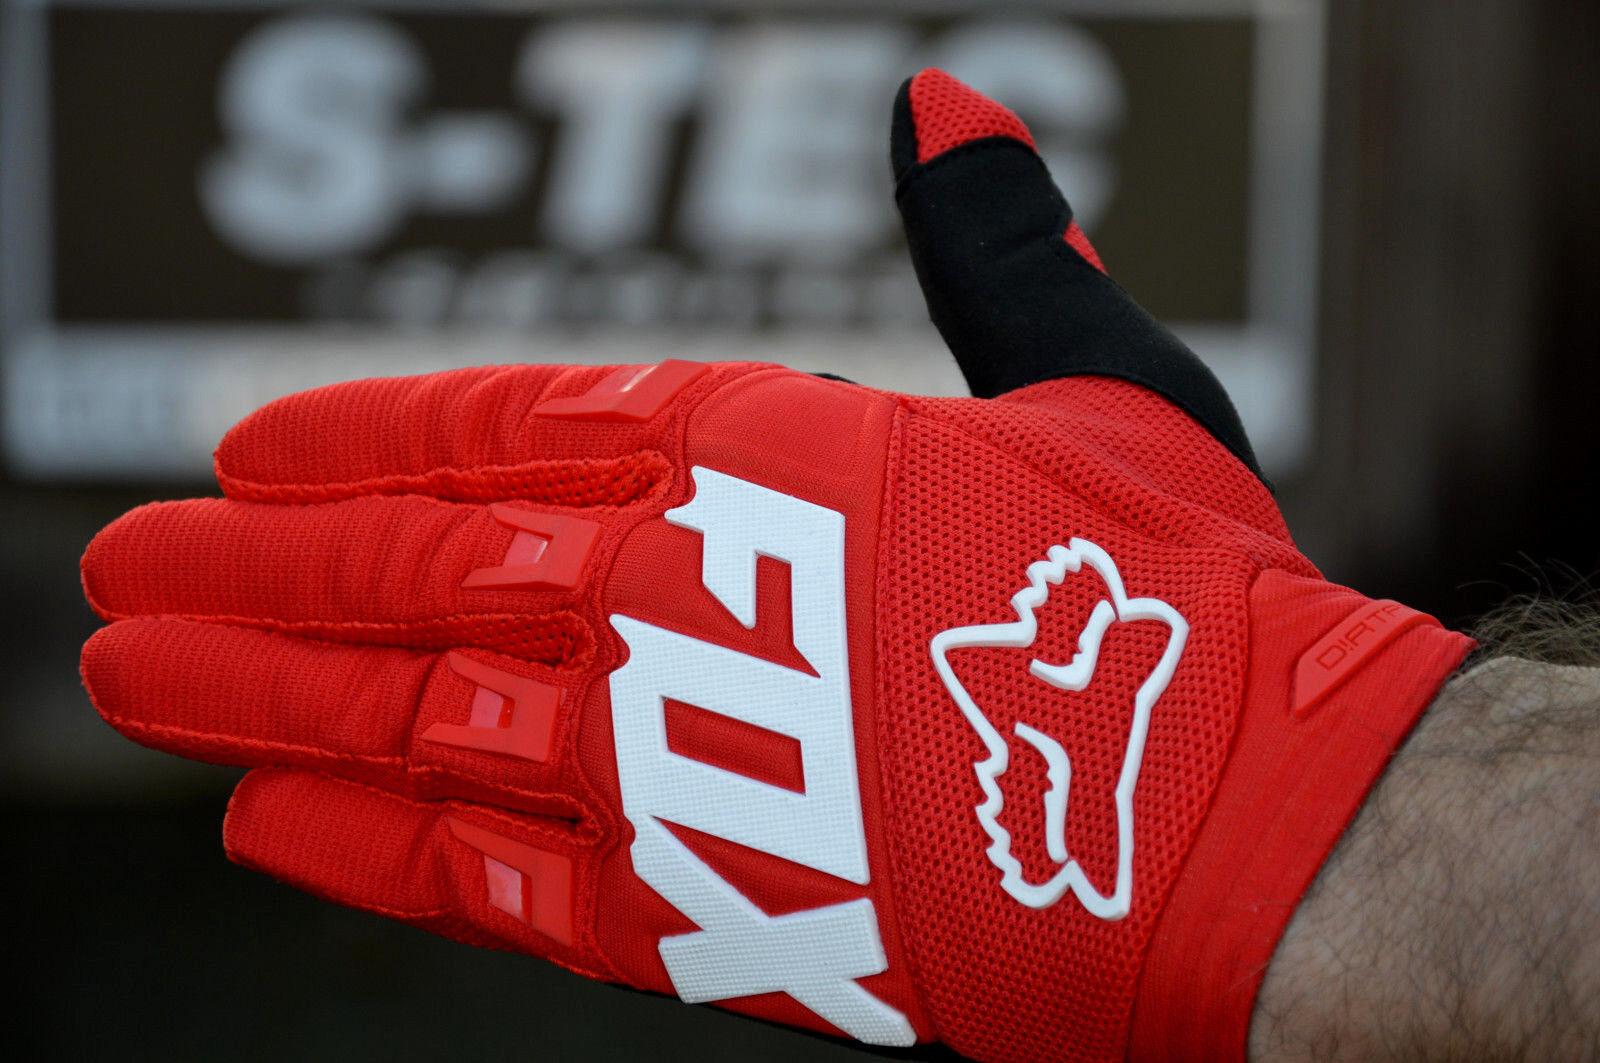 Fox Dirtpaw Race MTB alpin Motocross longtemps Gants Rouge 2018 2018 2018 NEUF 9a1403